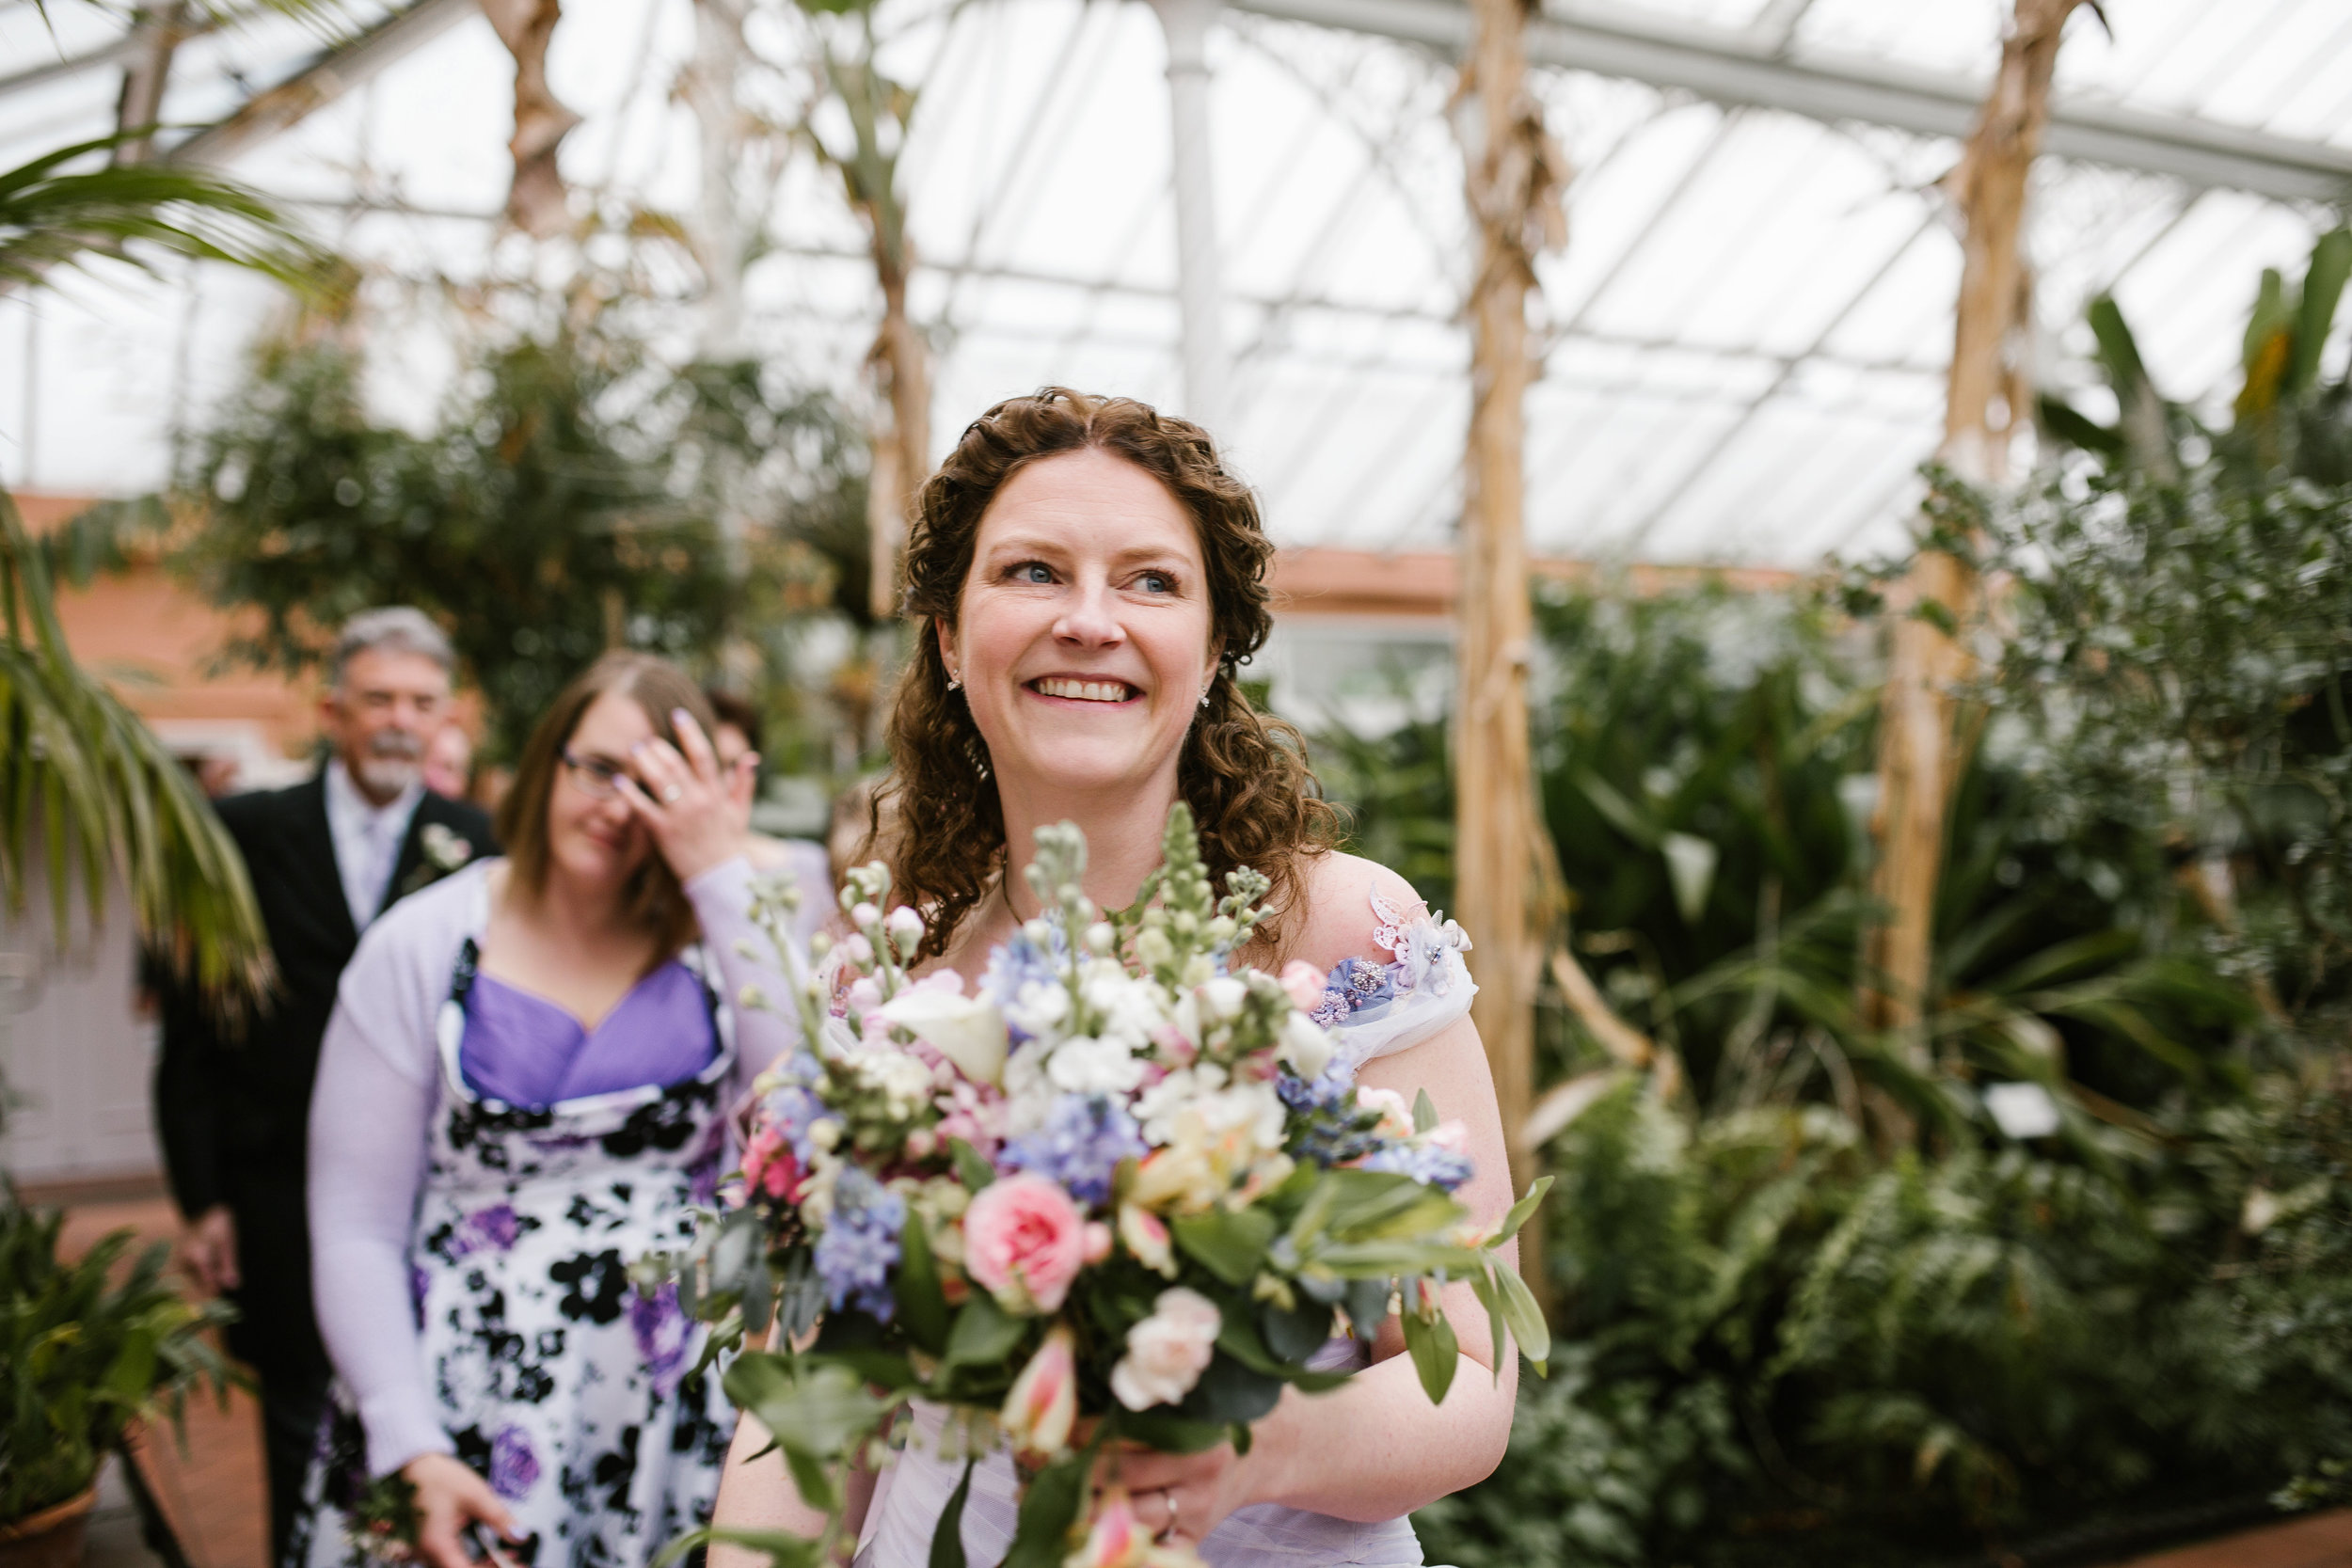 Botanical Gardens Birmingham, botanical gardens wedding, birmingham wedding photographer, purple wedding dress-19.jpg